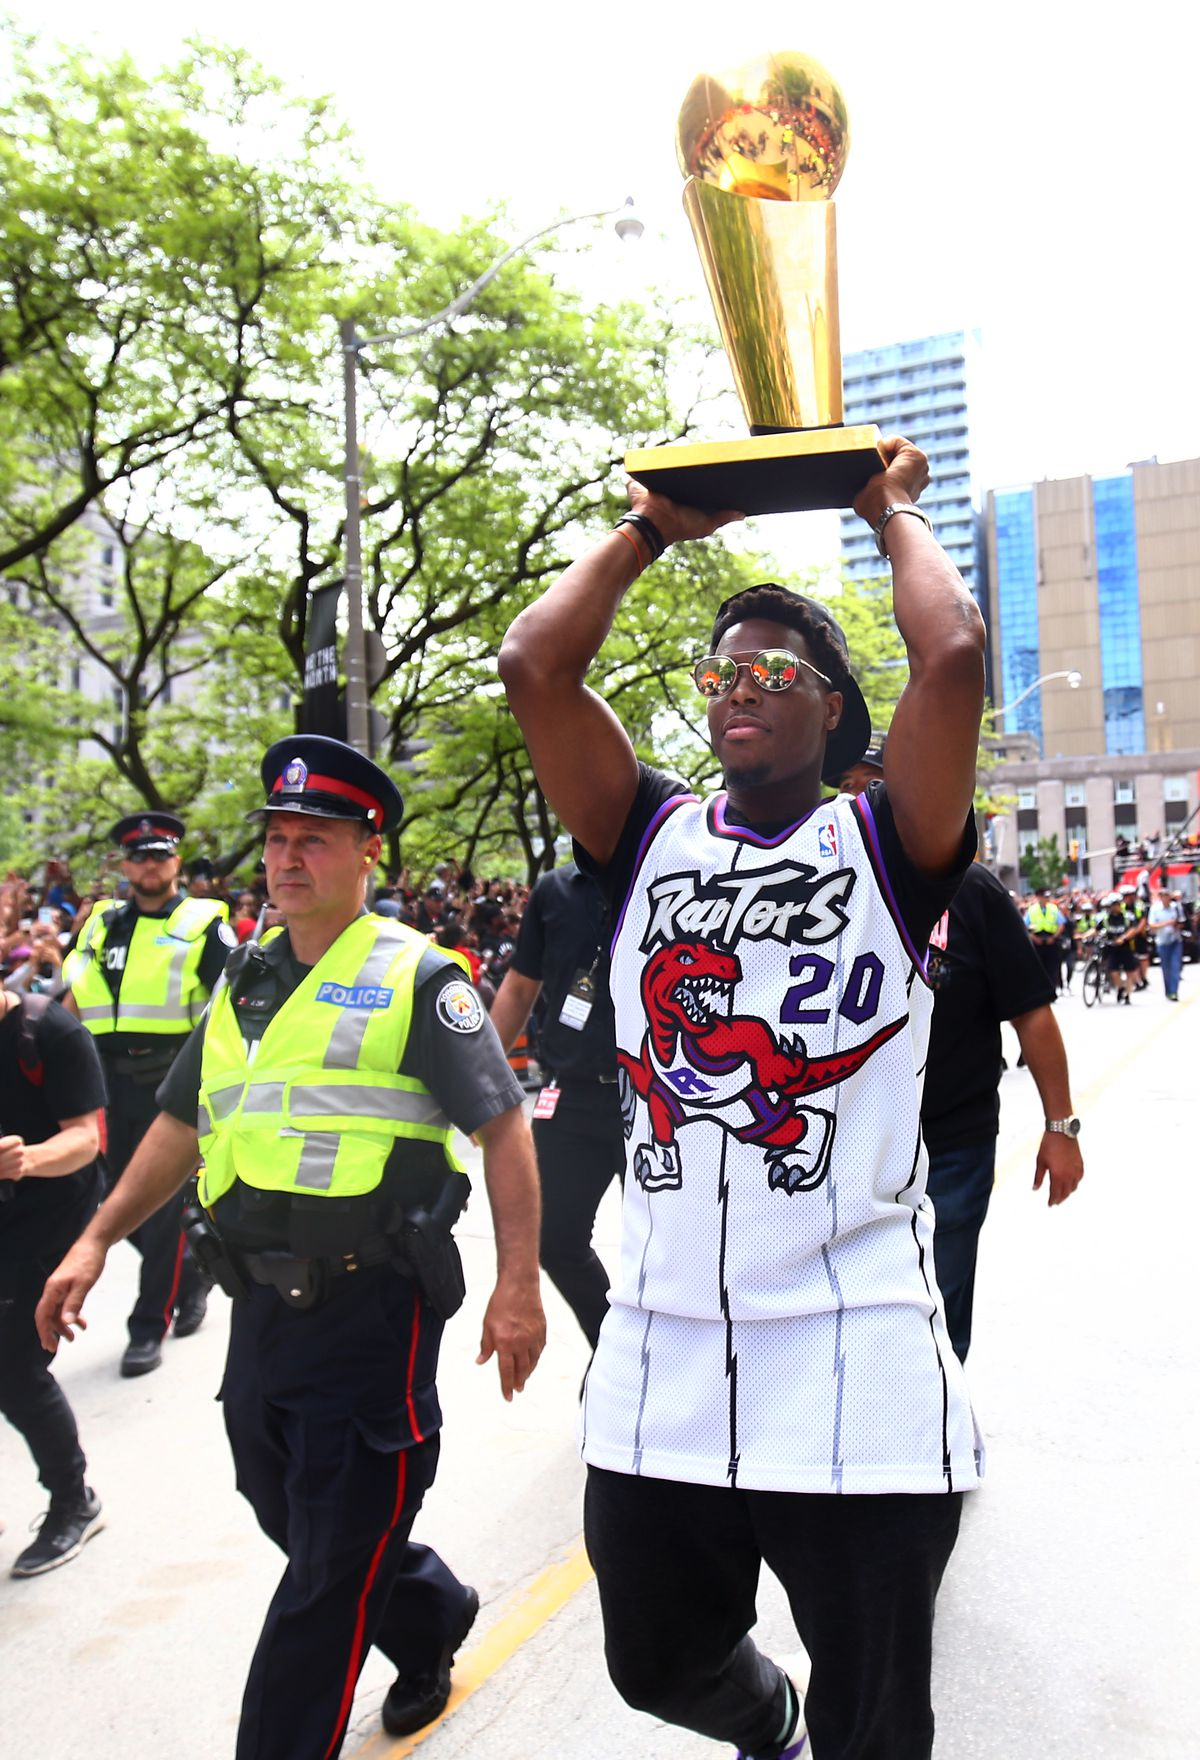 Toronto Raptors Victory Parade & Rally